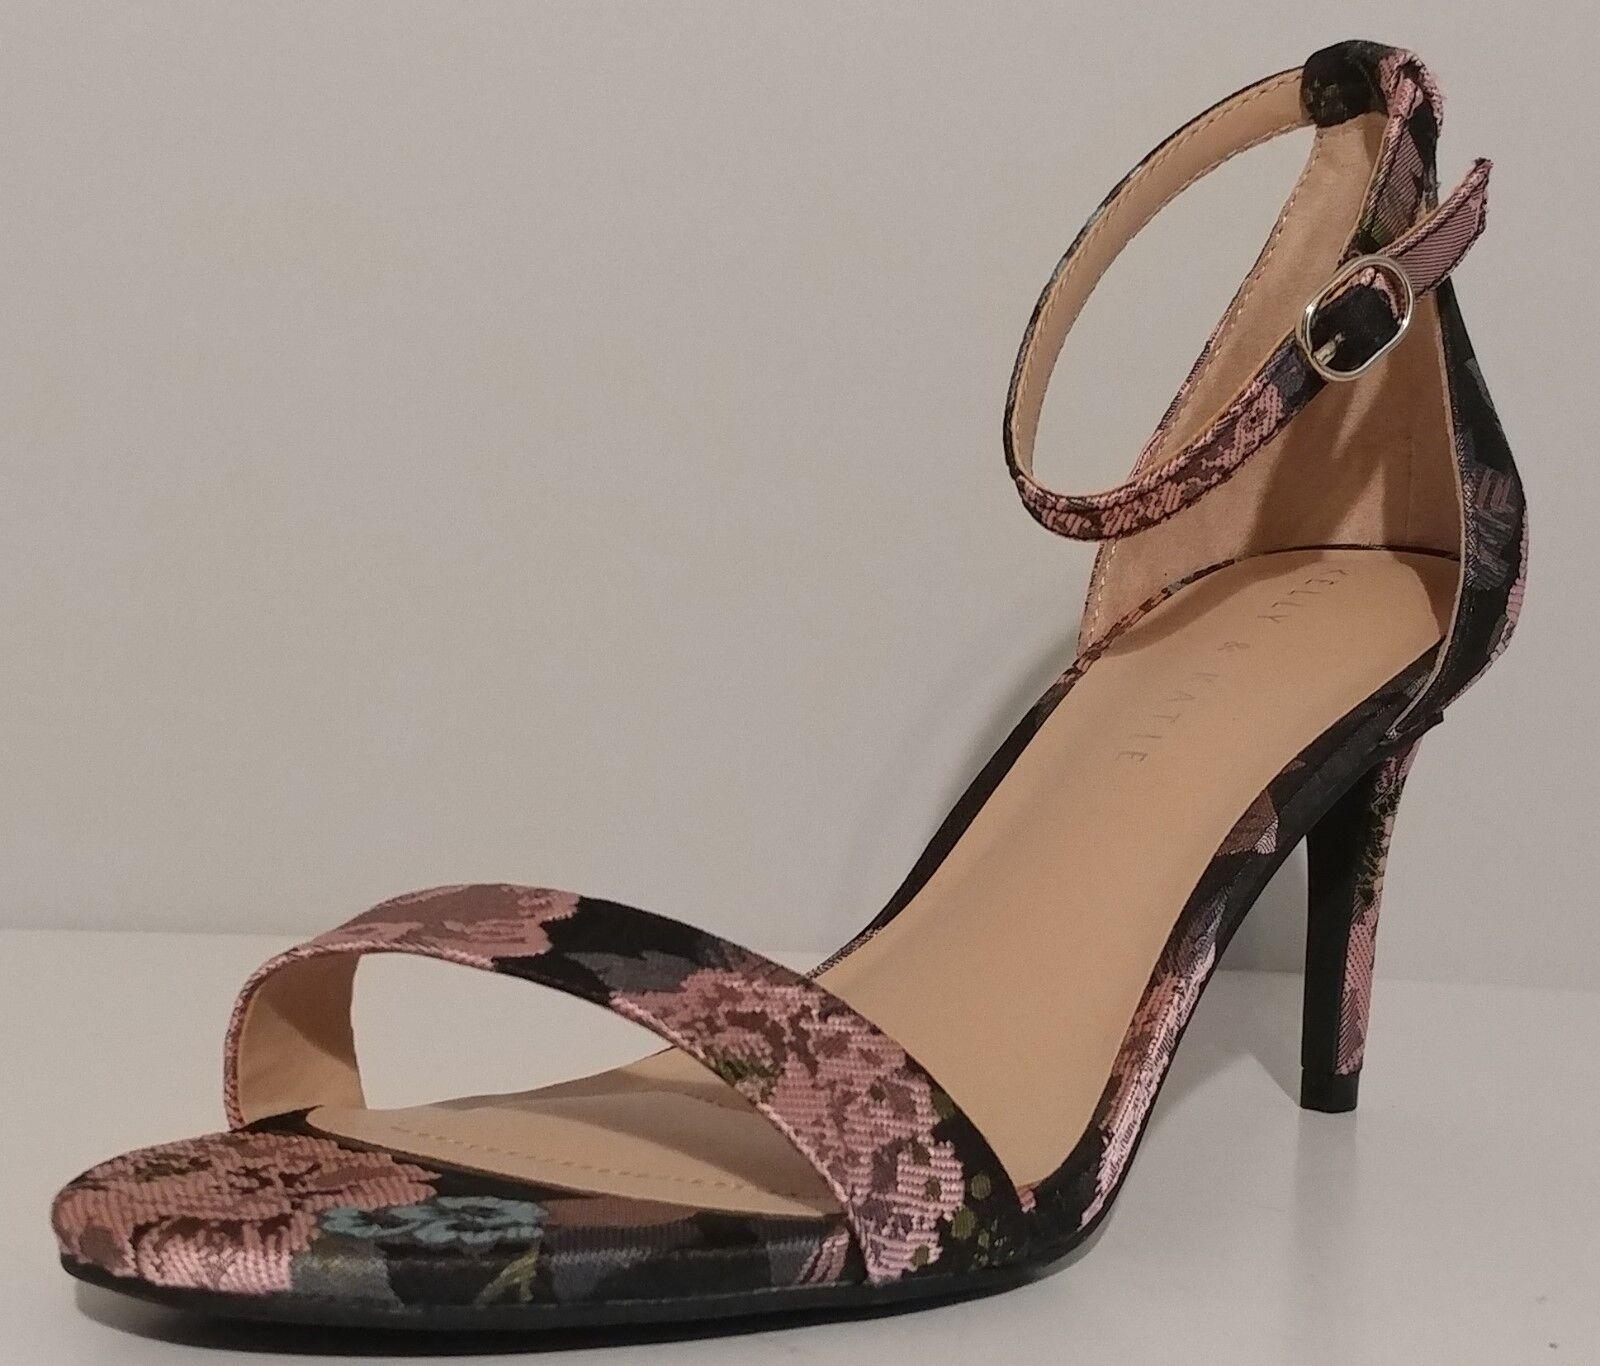 NEW   Kelly & Katie Pink Satin Kirstie Kirstie Kirstie Sandals 3  Heels Size 8M US 38M EU e8b7ee